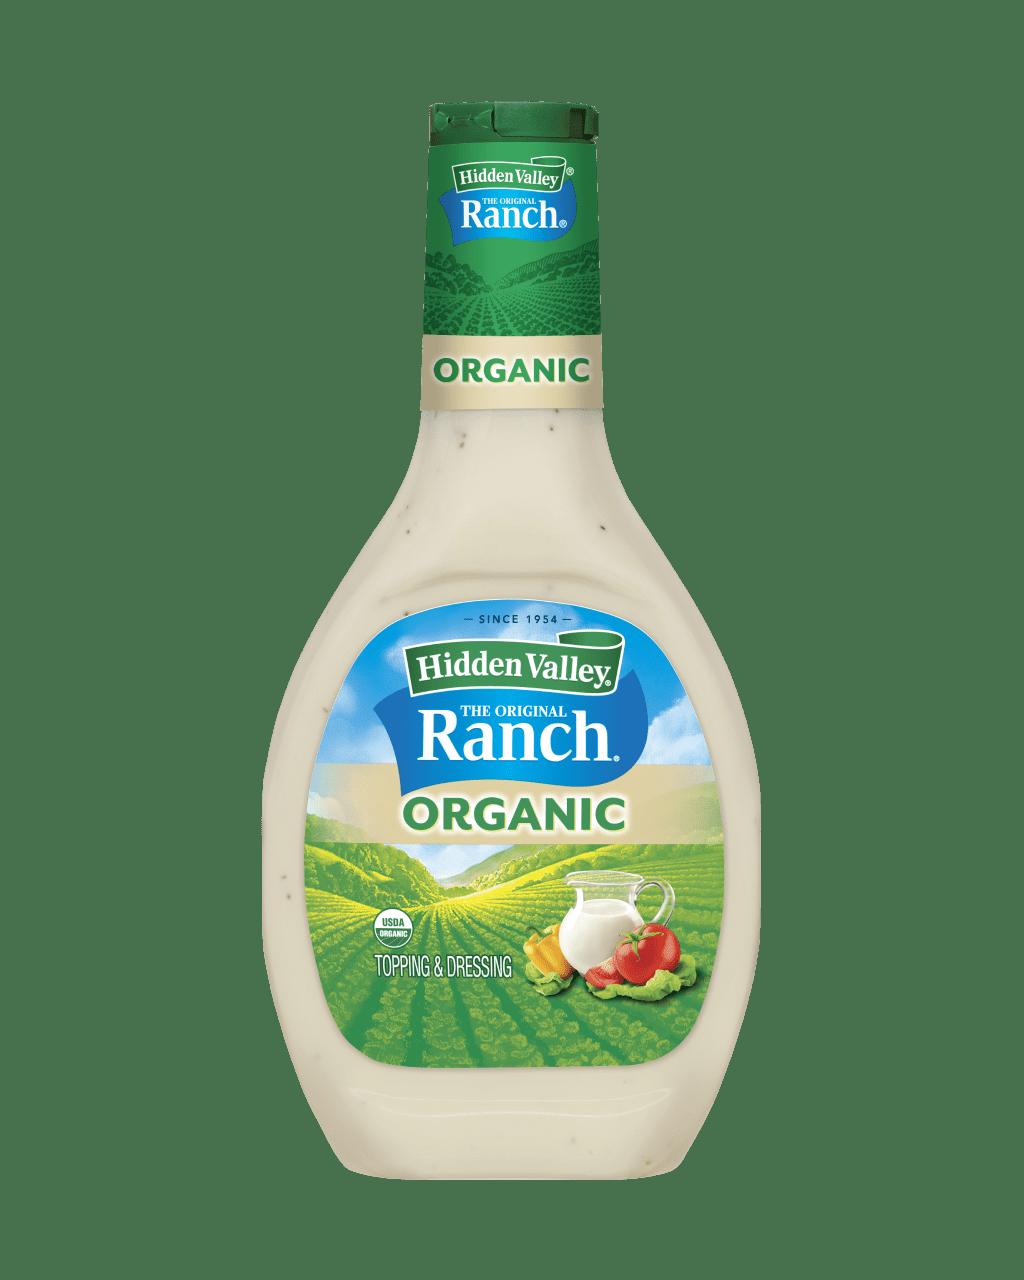 Hidden Valley® Original Ranch® Organic Topping & Dressing